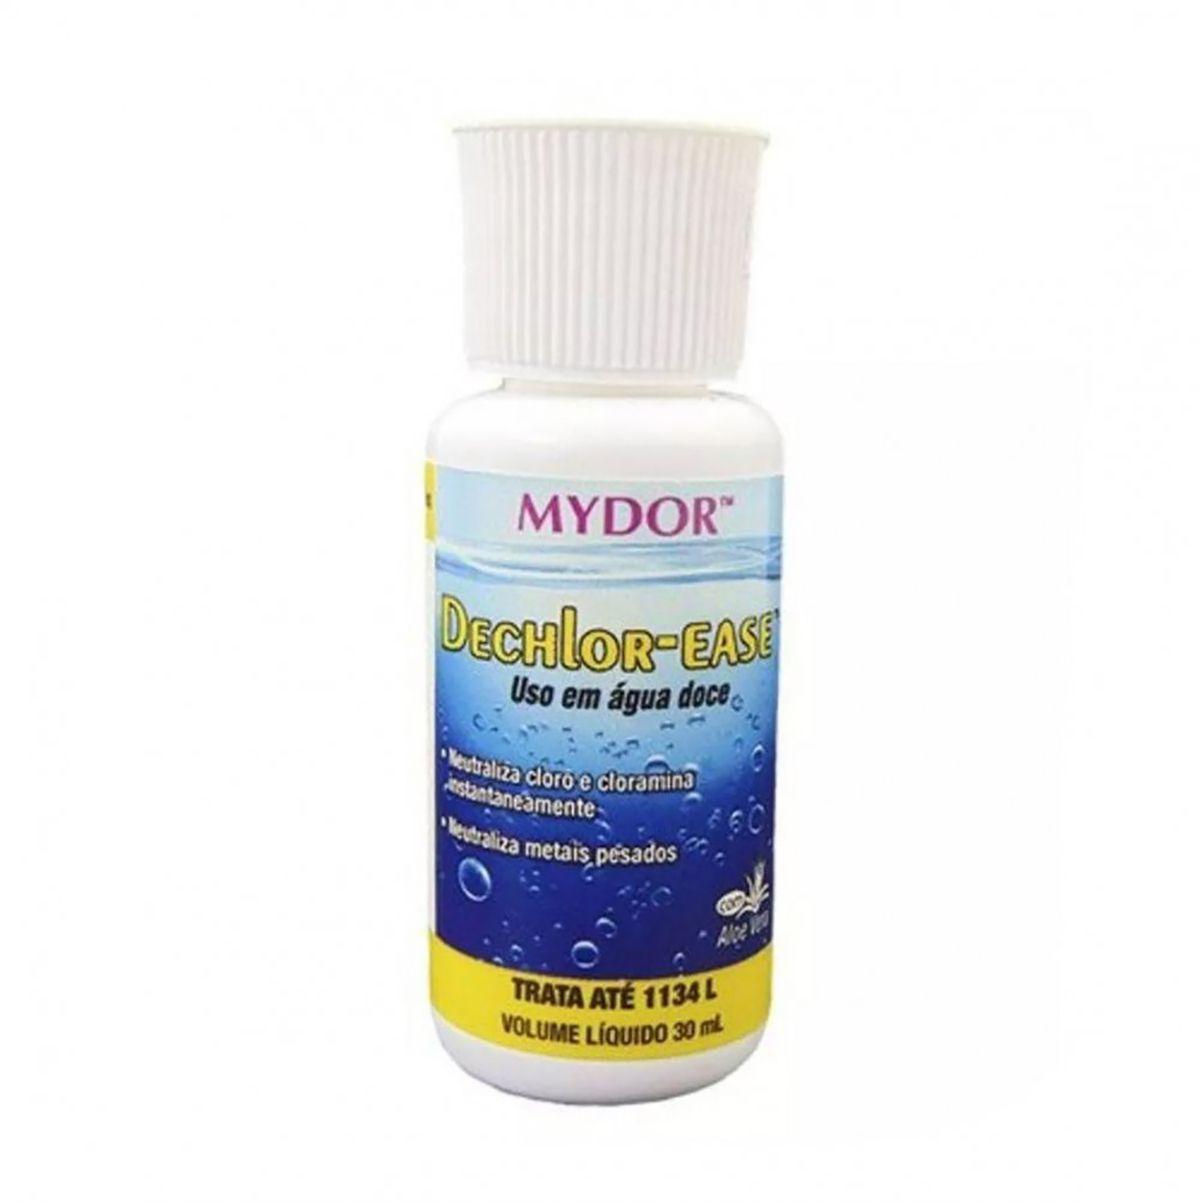 Removedor de Cloro Mydor Dechlor Ease - 30ml